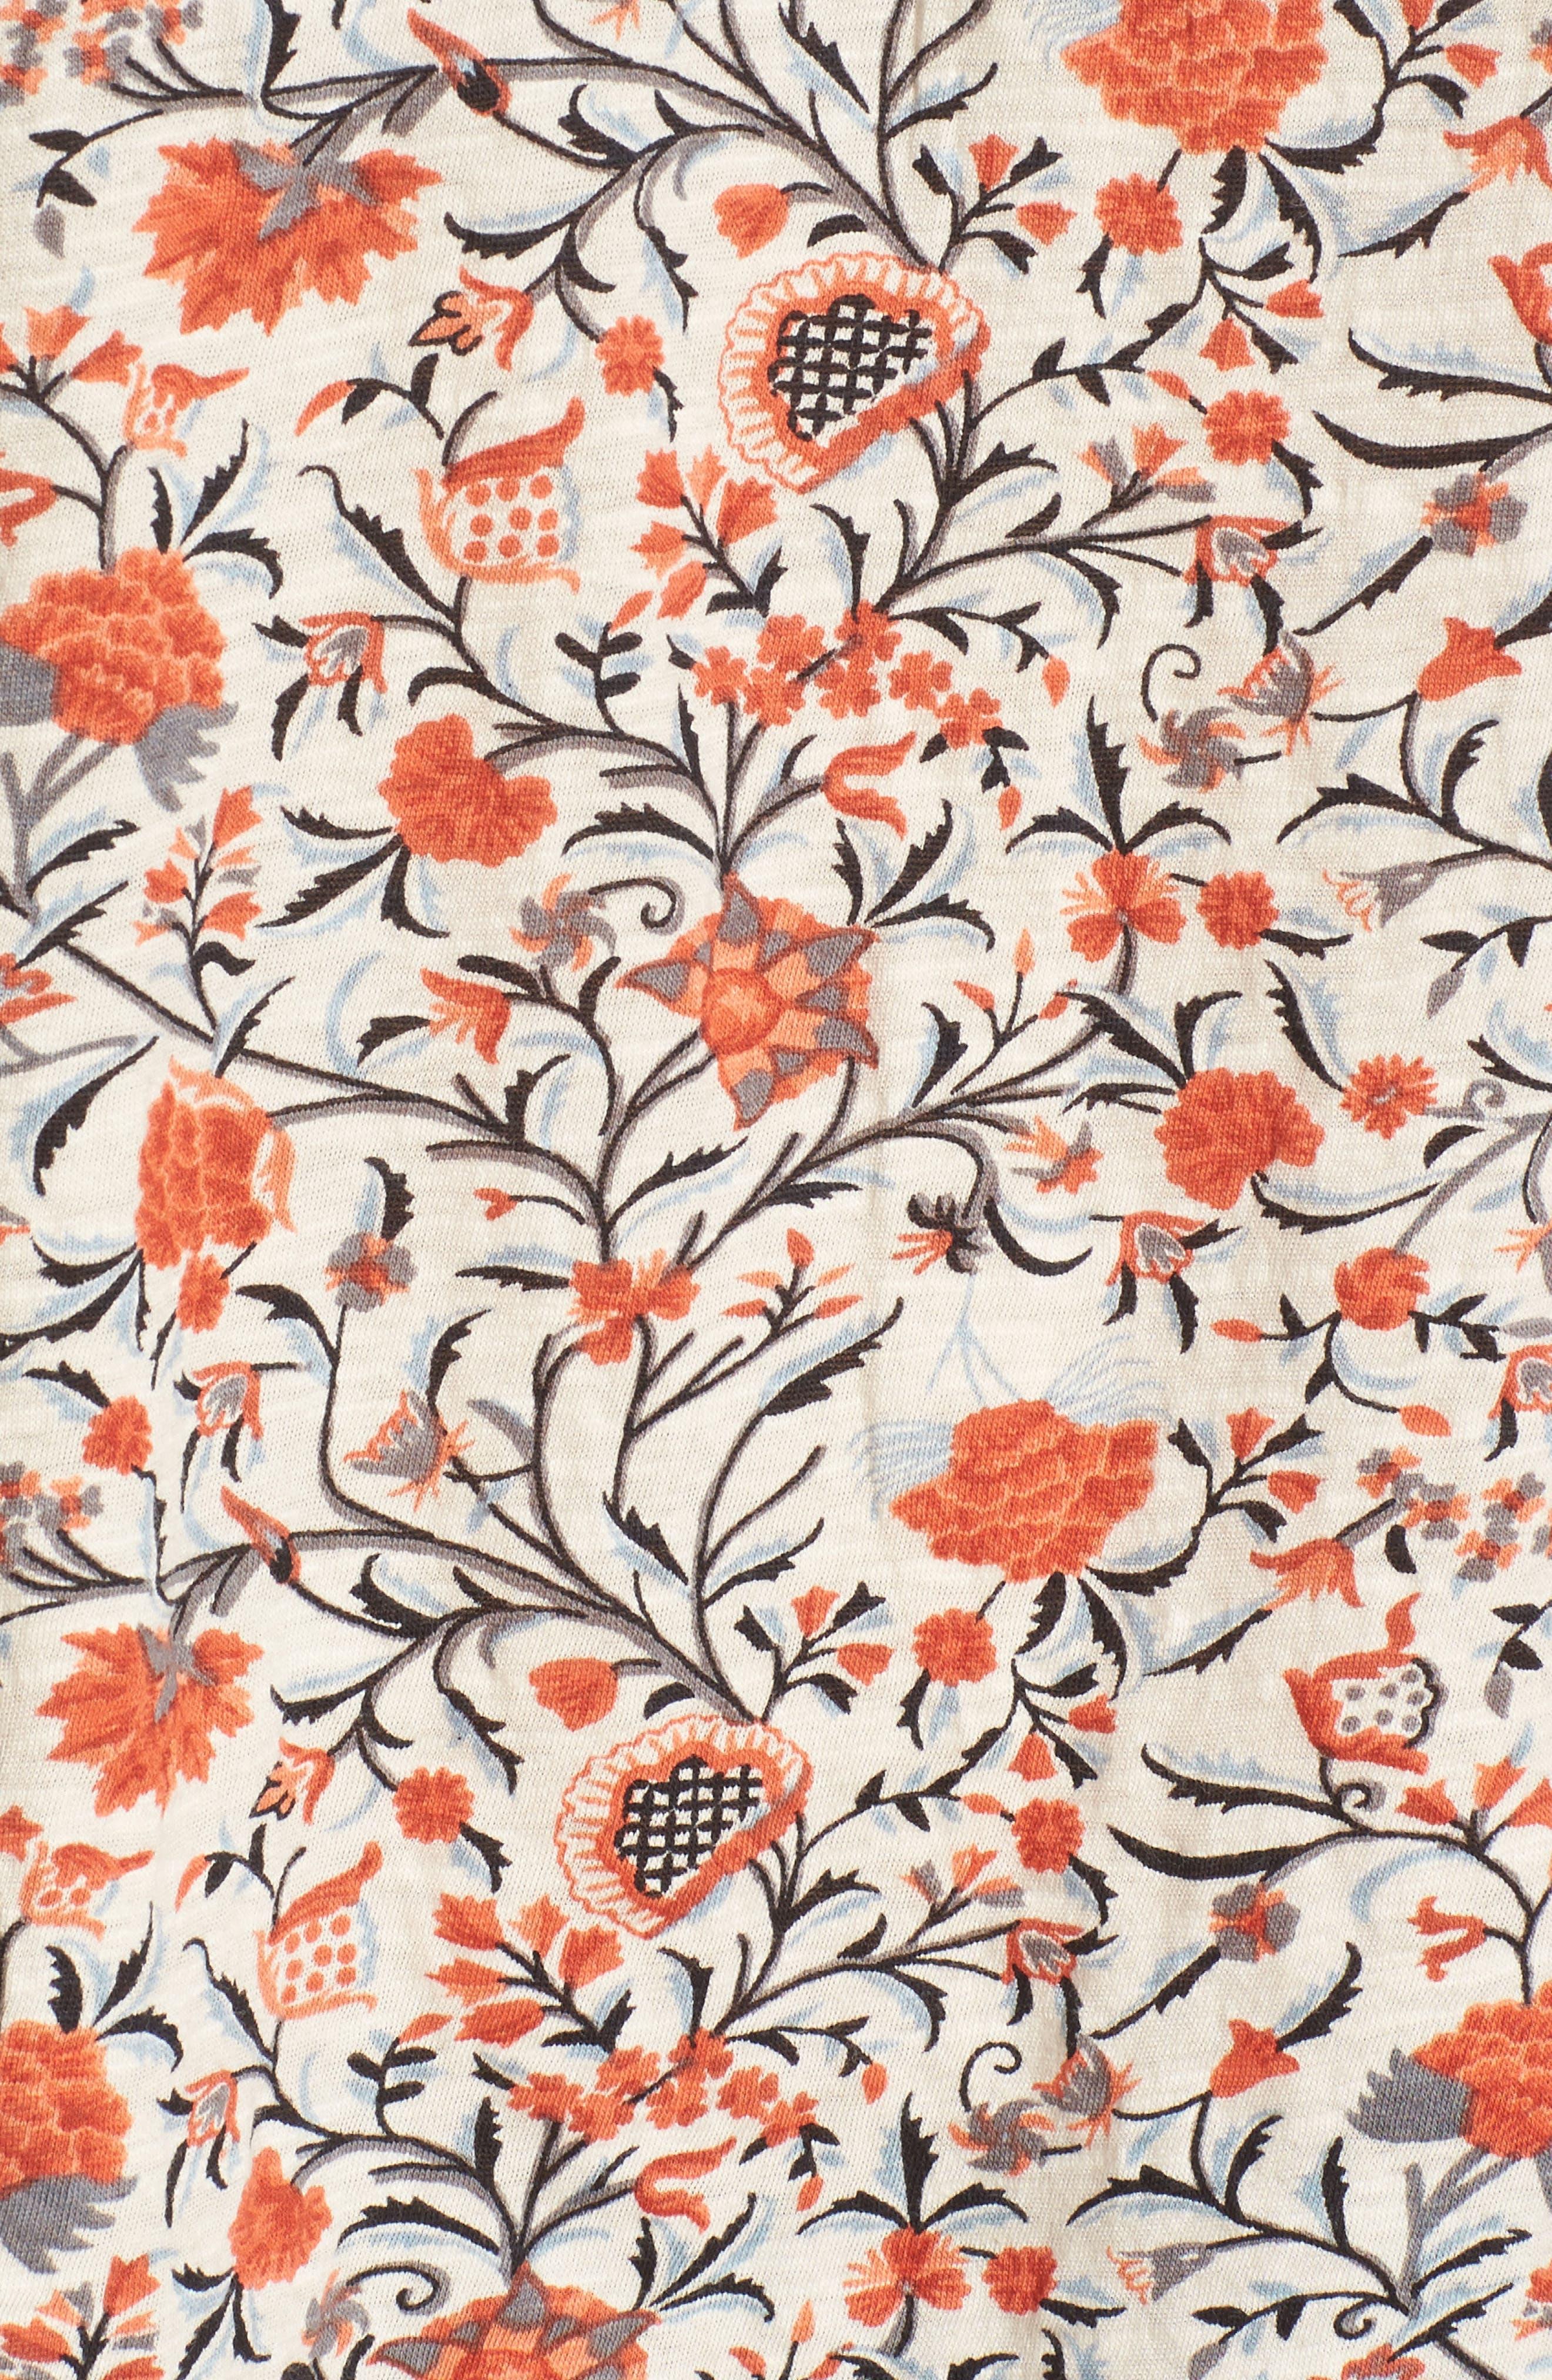 Smocked Floral Print Blouse,                             Alternate thumbnail 5, color,                             900